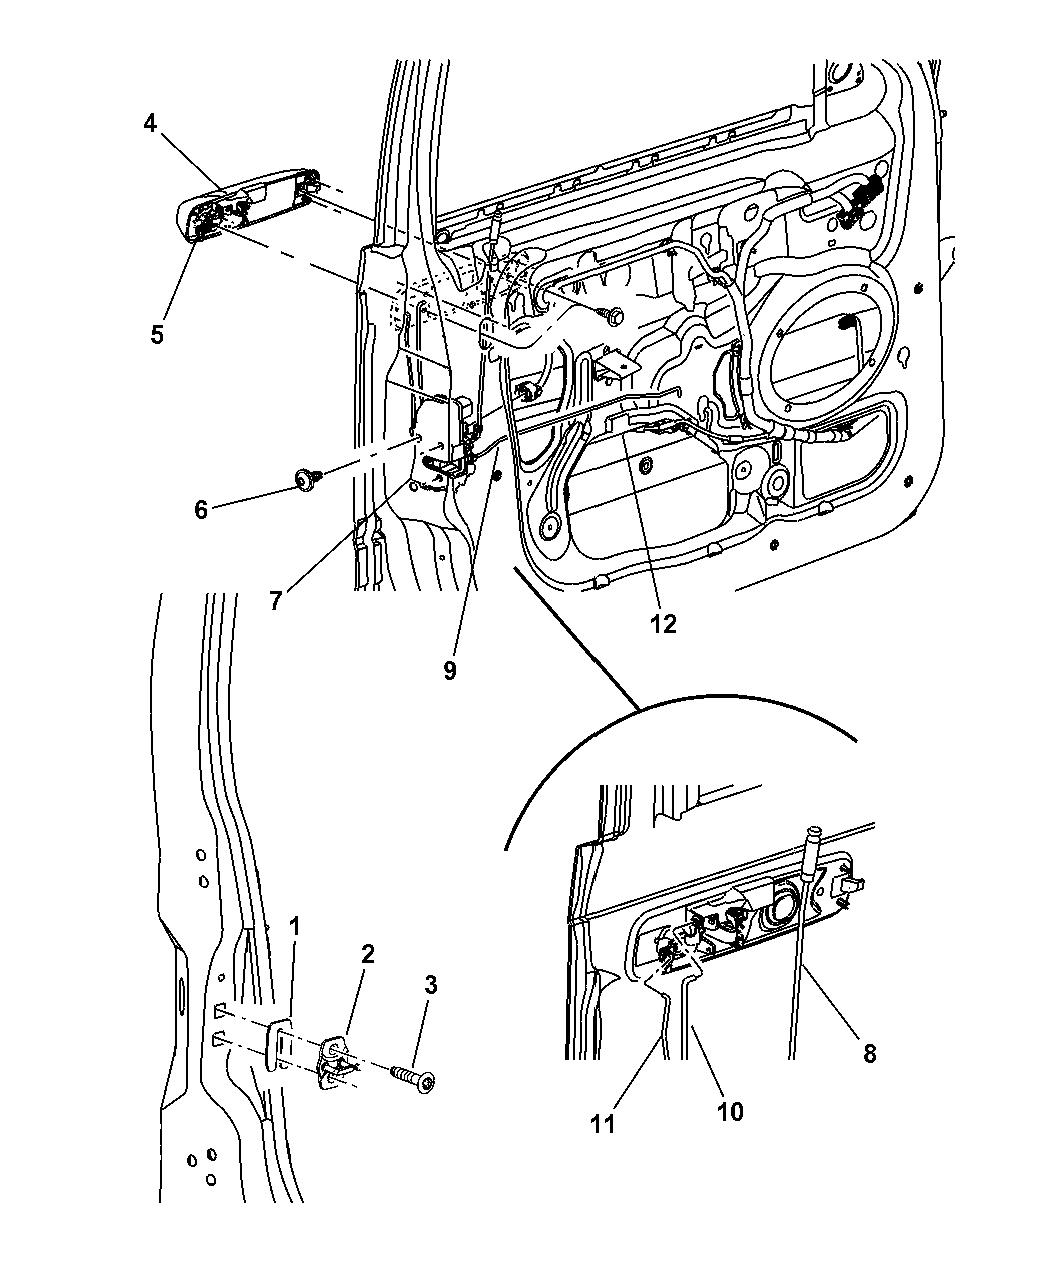 55396906ab Genuine Jeep Link Door Latch Diagrams 2007 Grand Cherokee Front Lock Controls